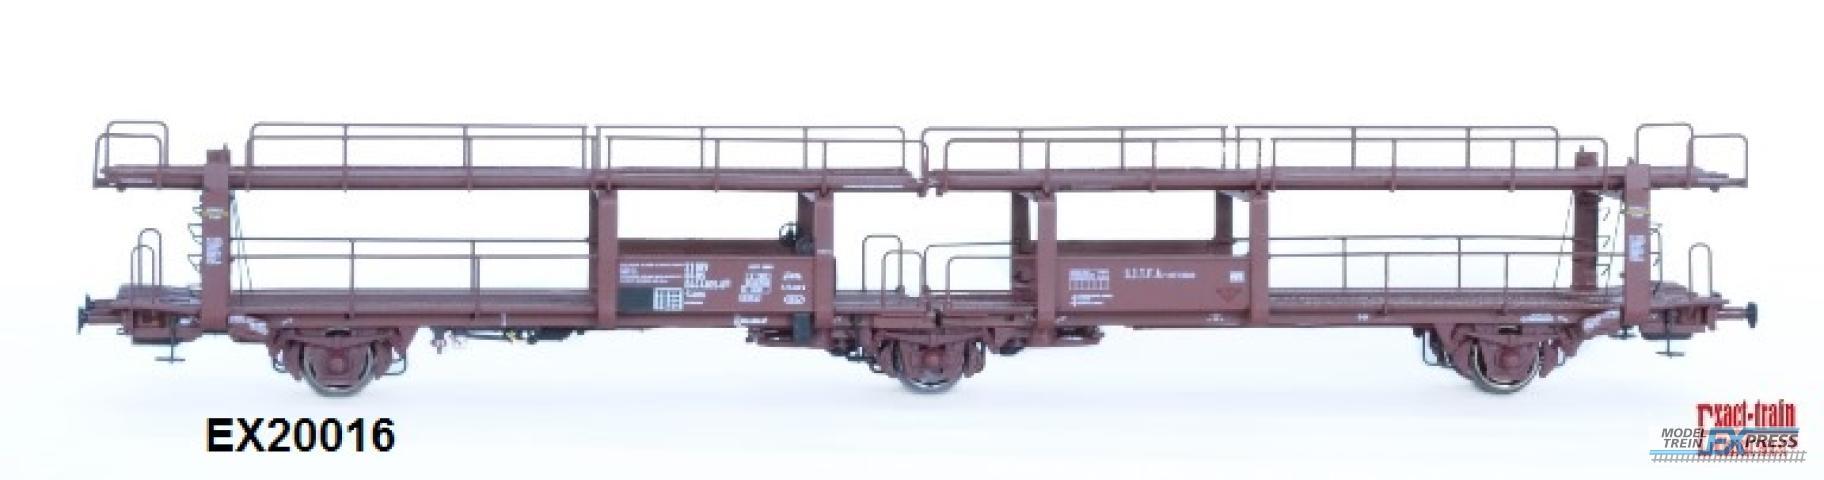 Exact-train 20016